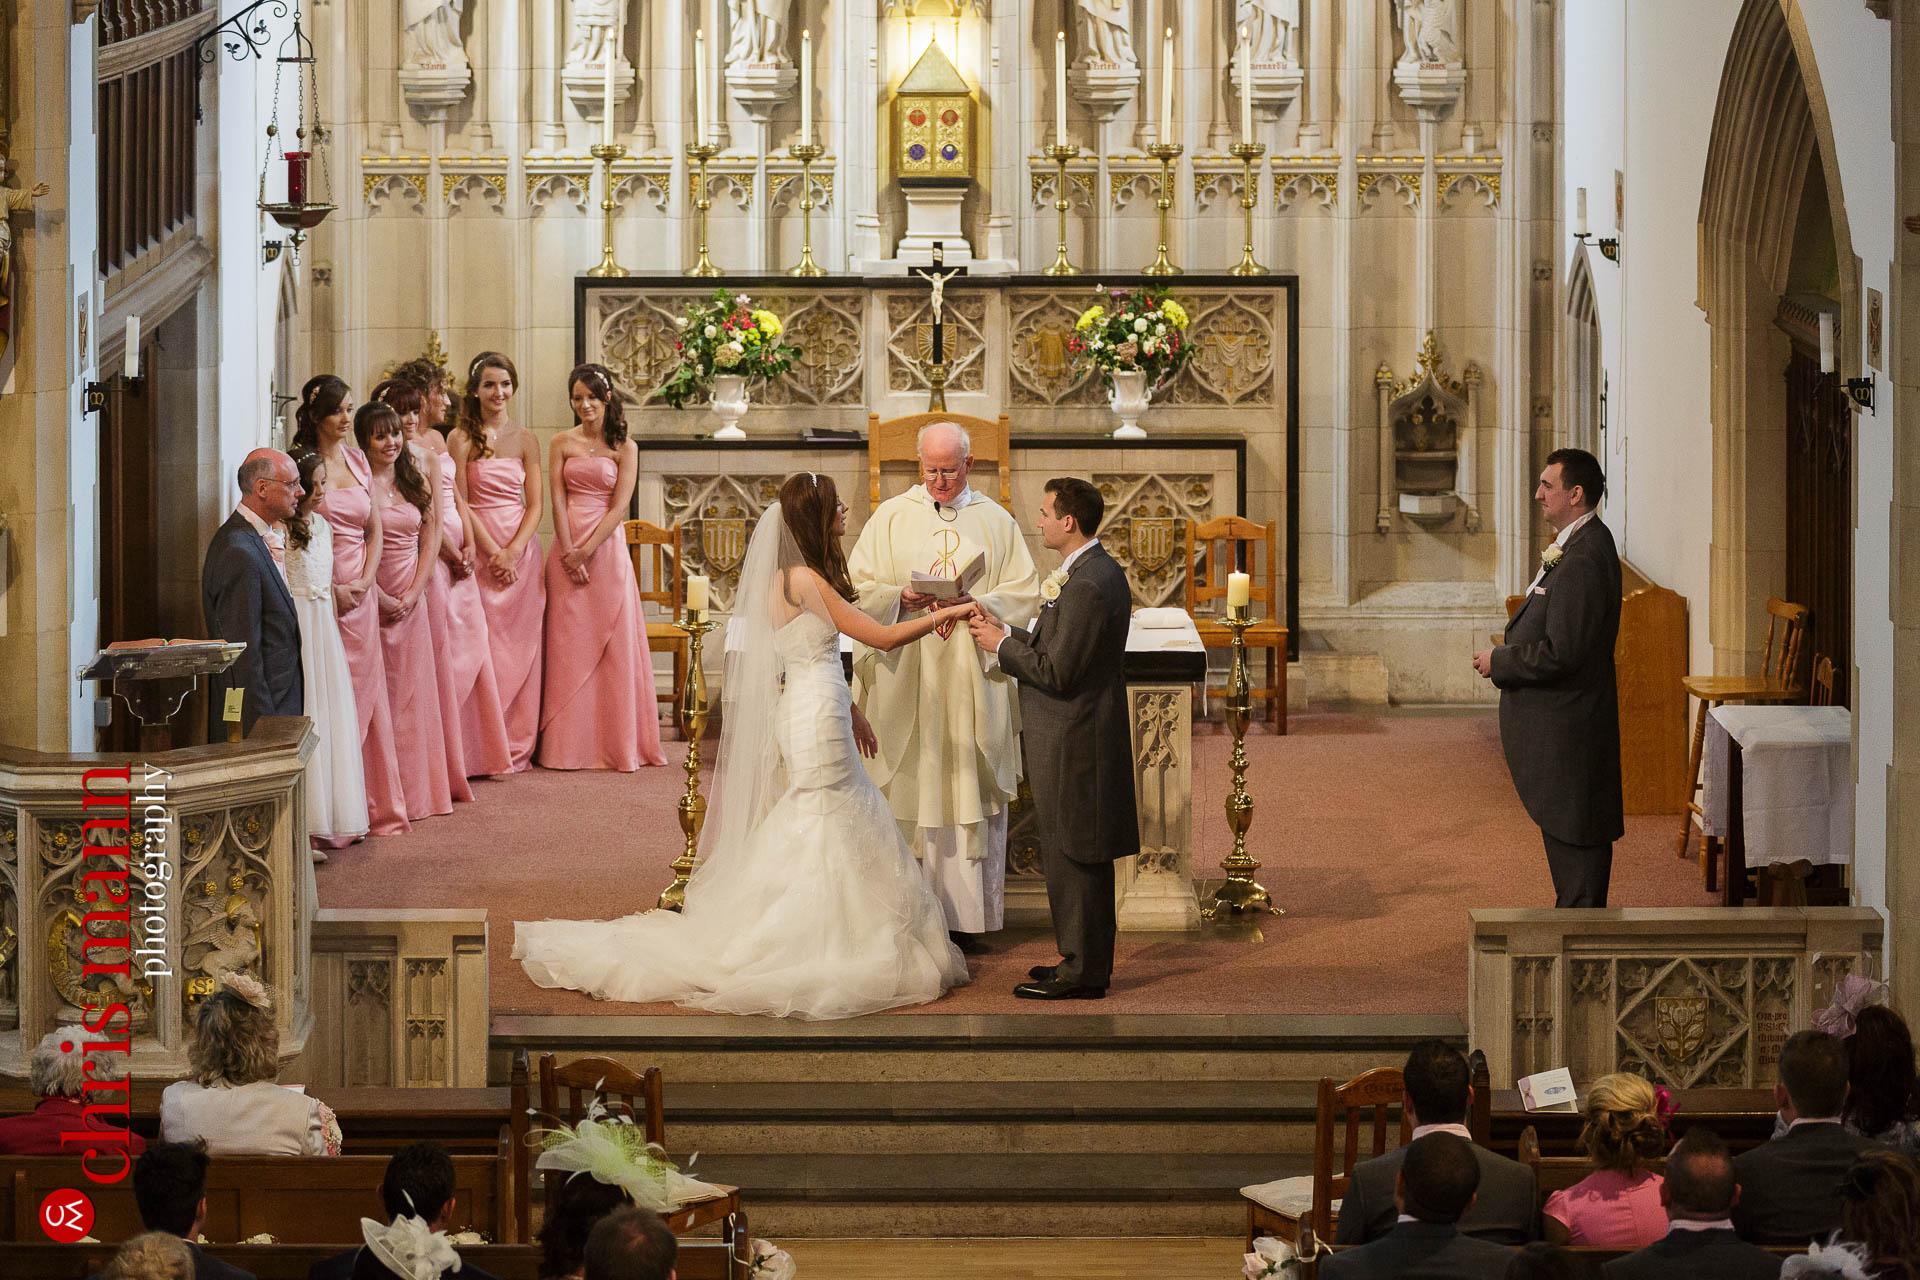 Brocket-Hall-wedding-photography-014